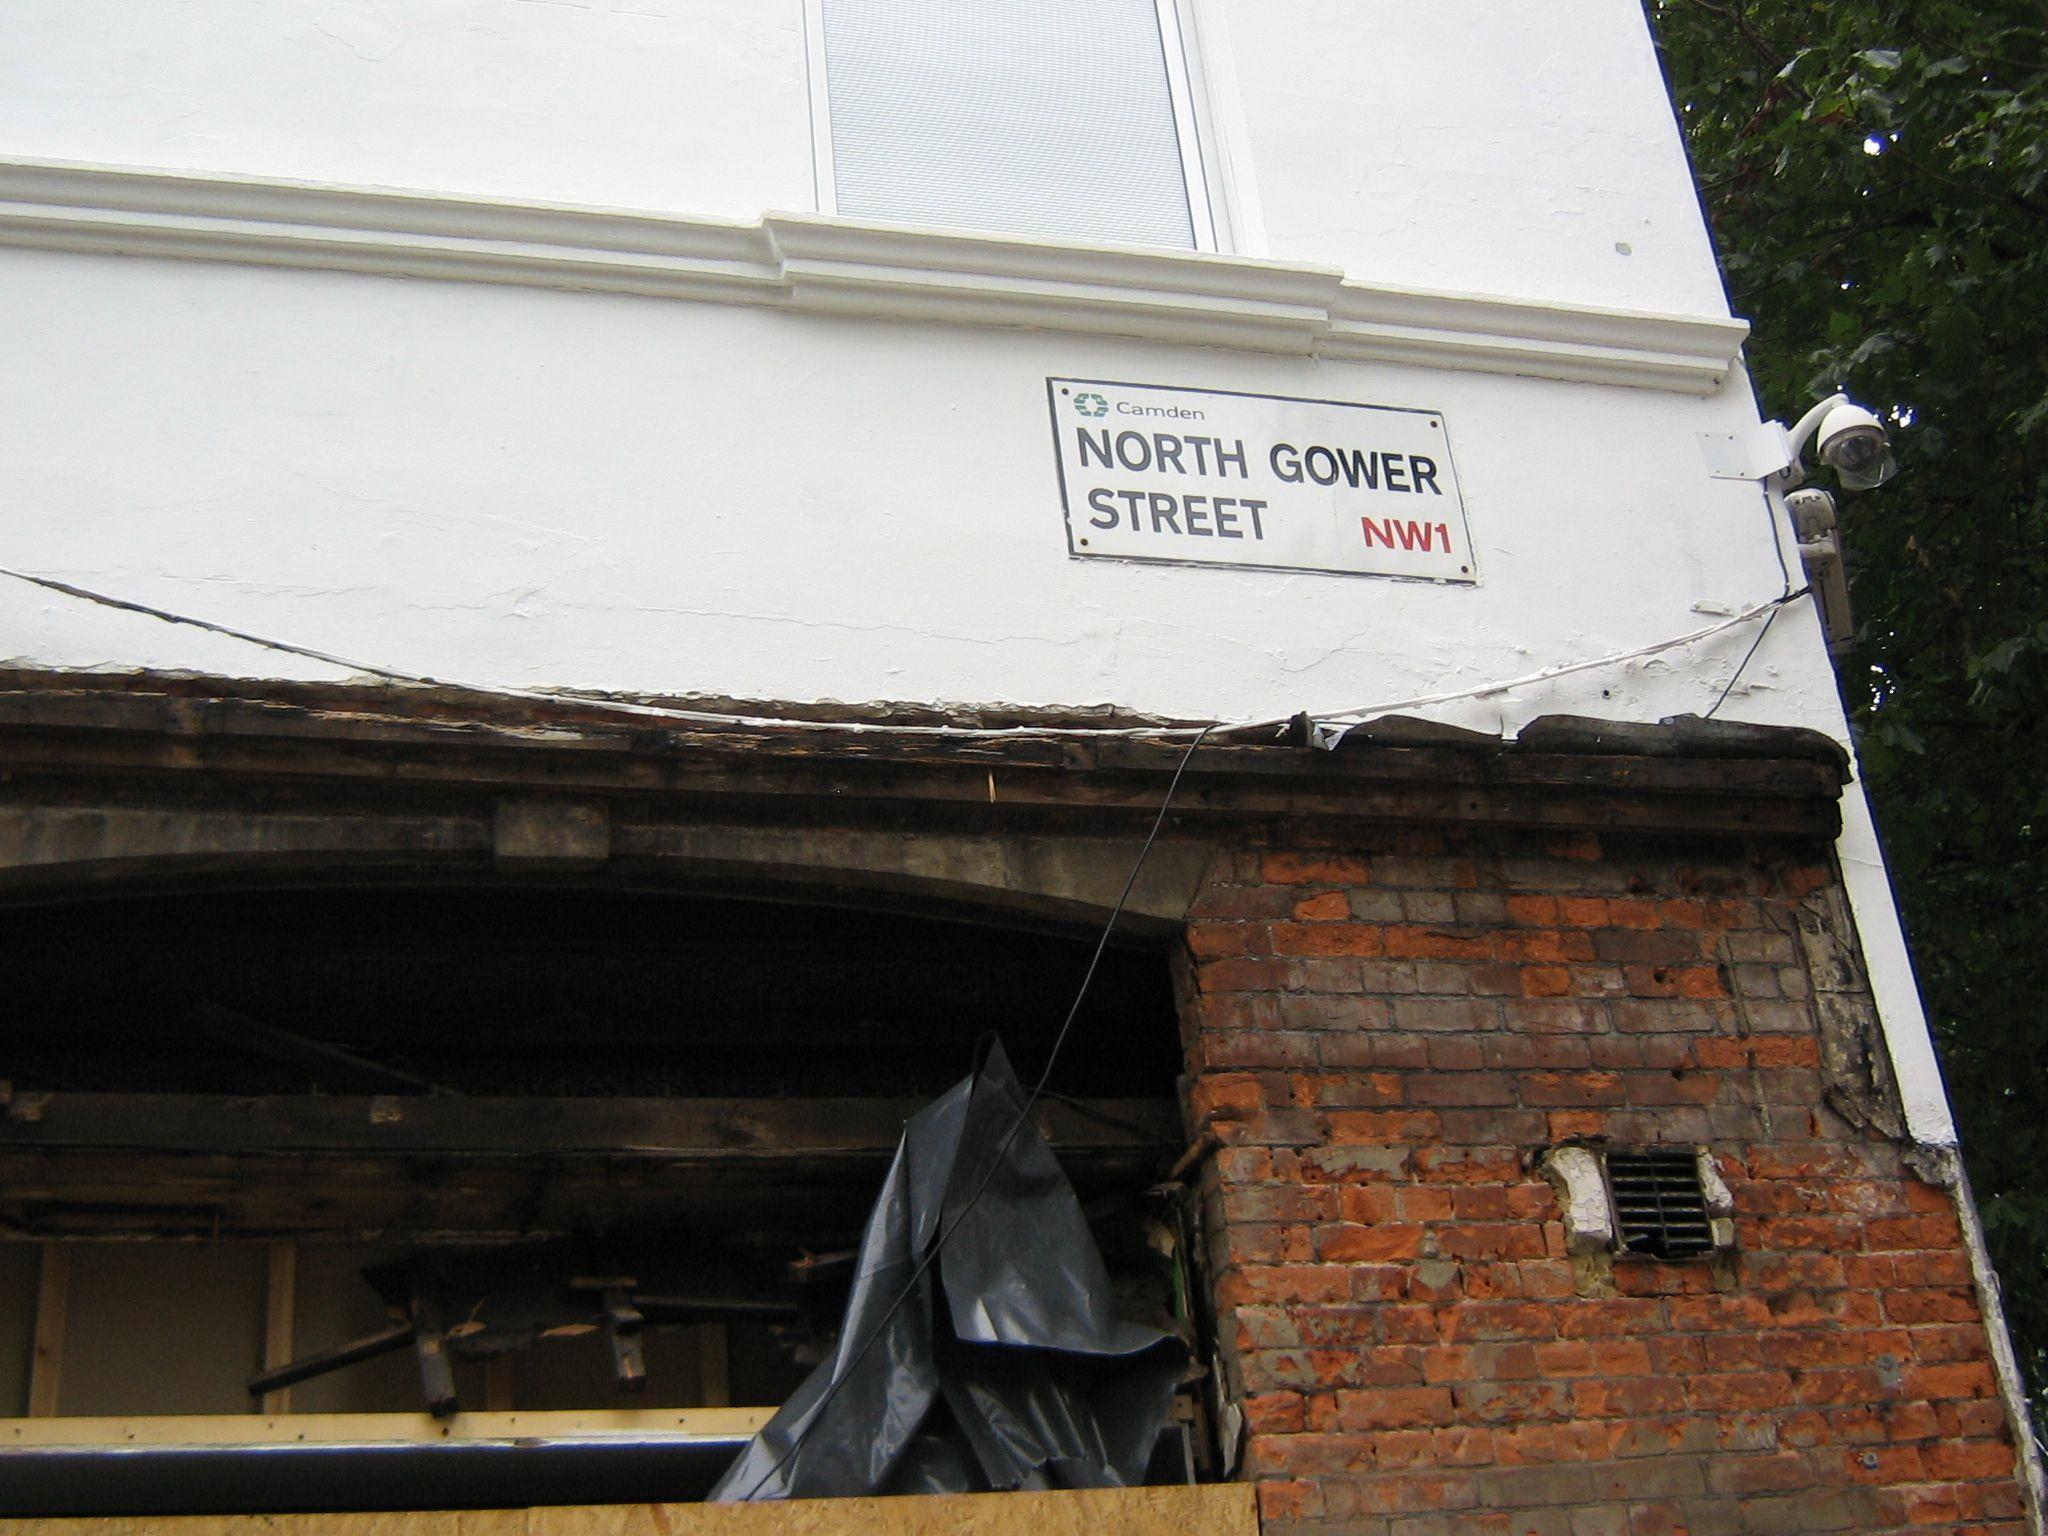 North Gower Street, London, 2011